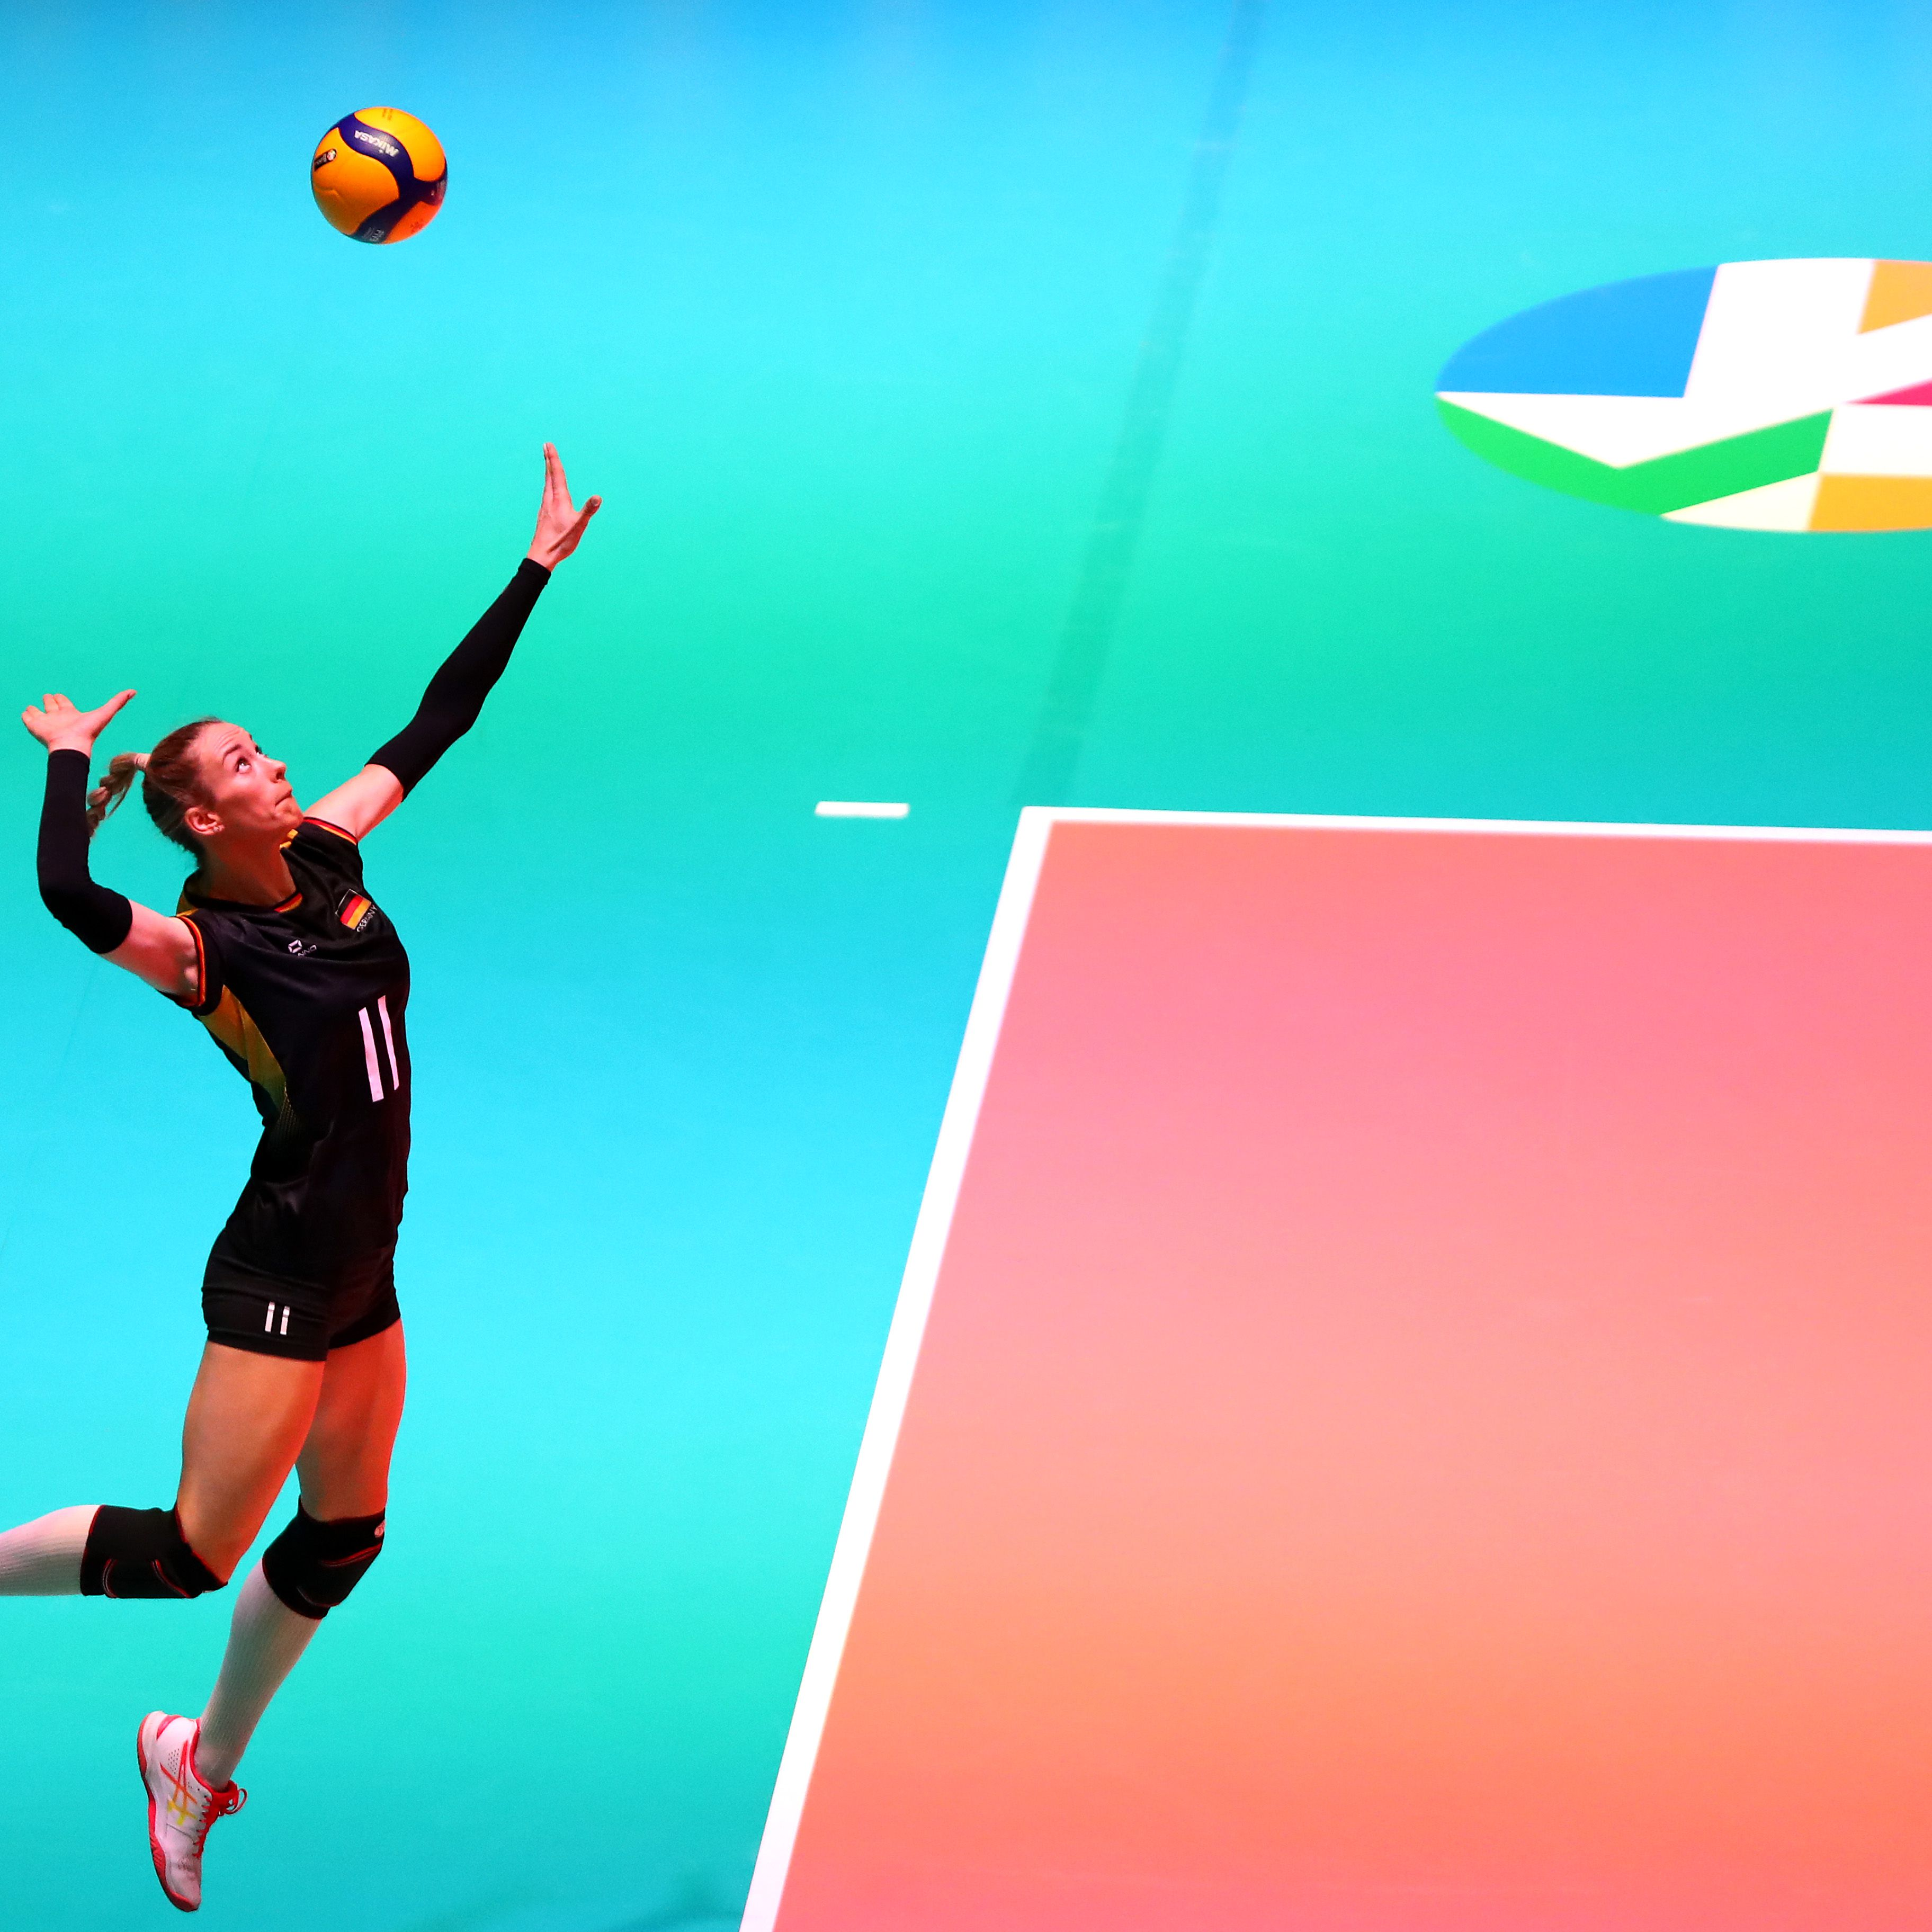 diferentes tipos de golpes en voleibol